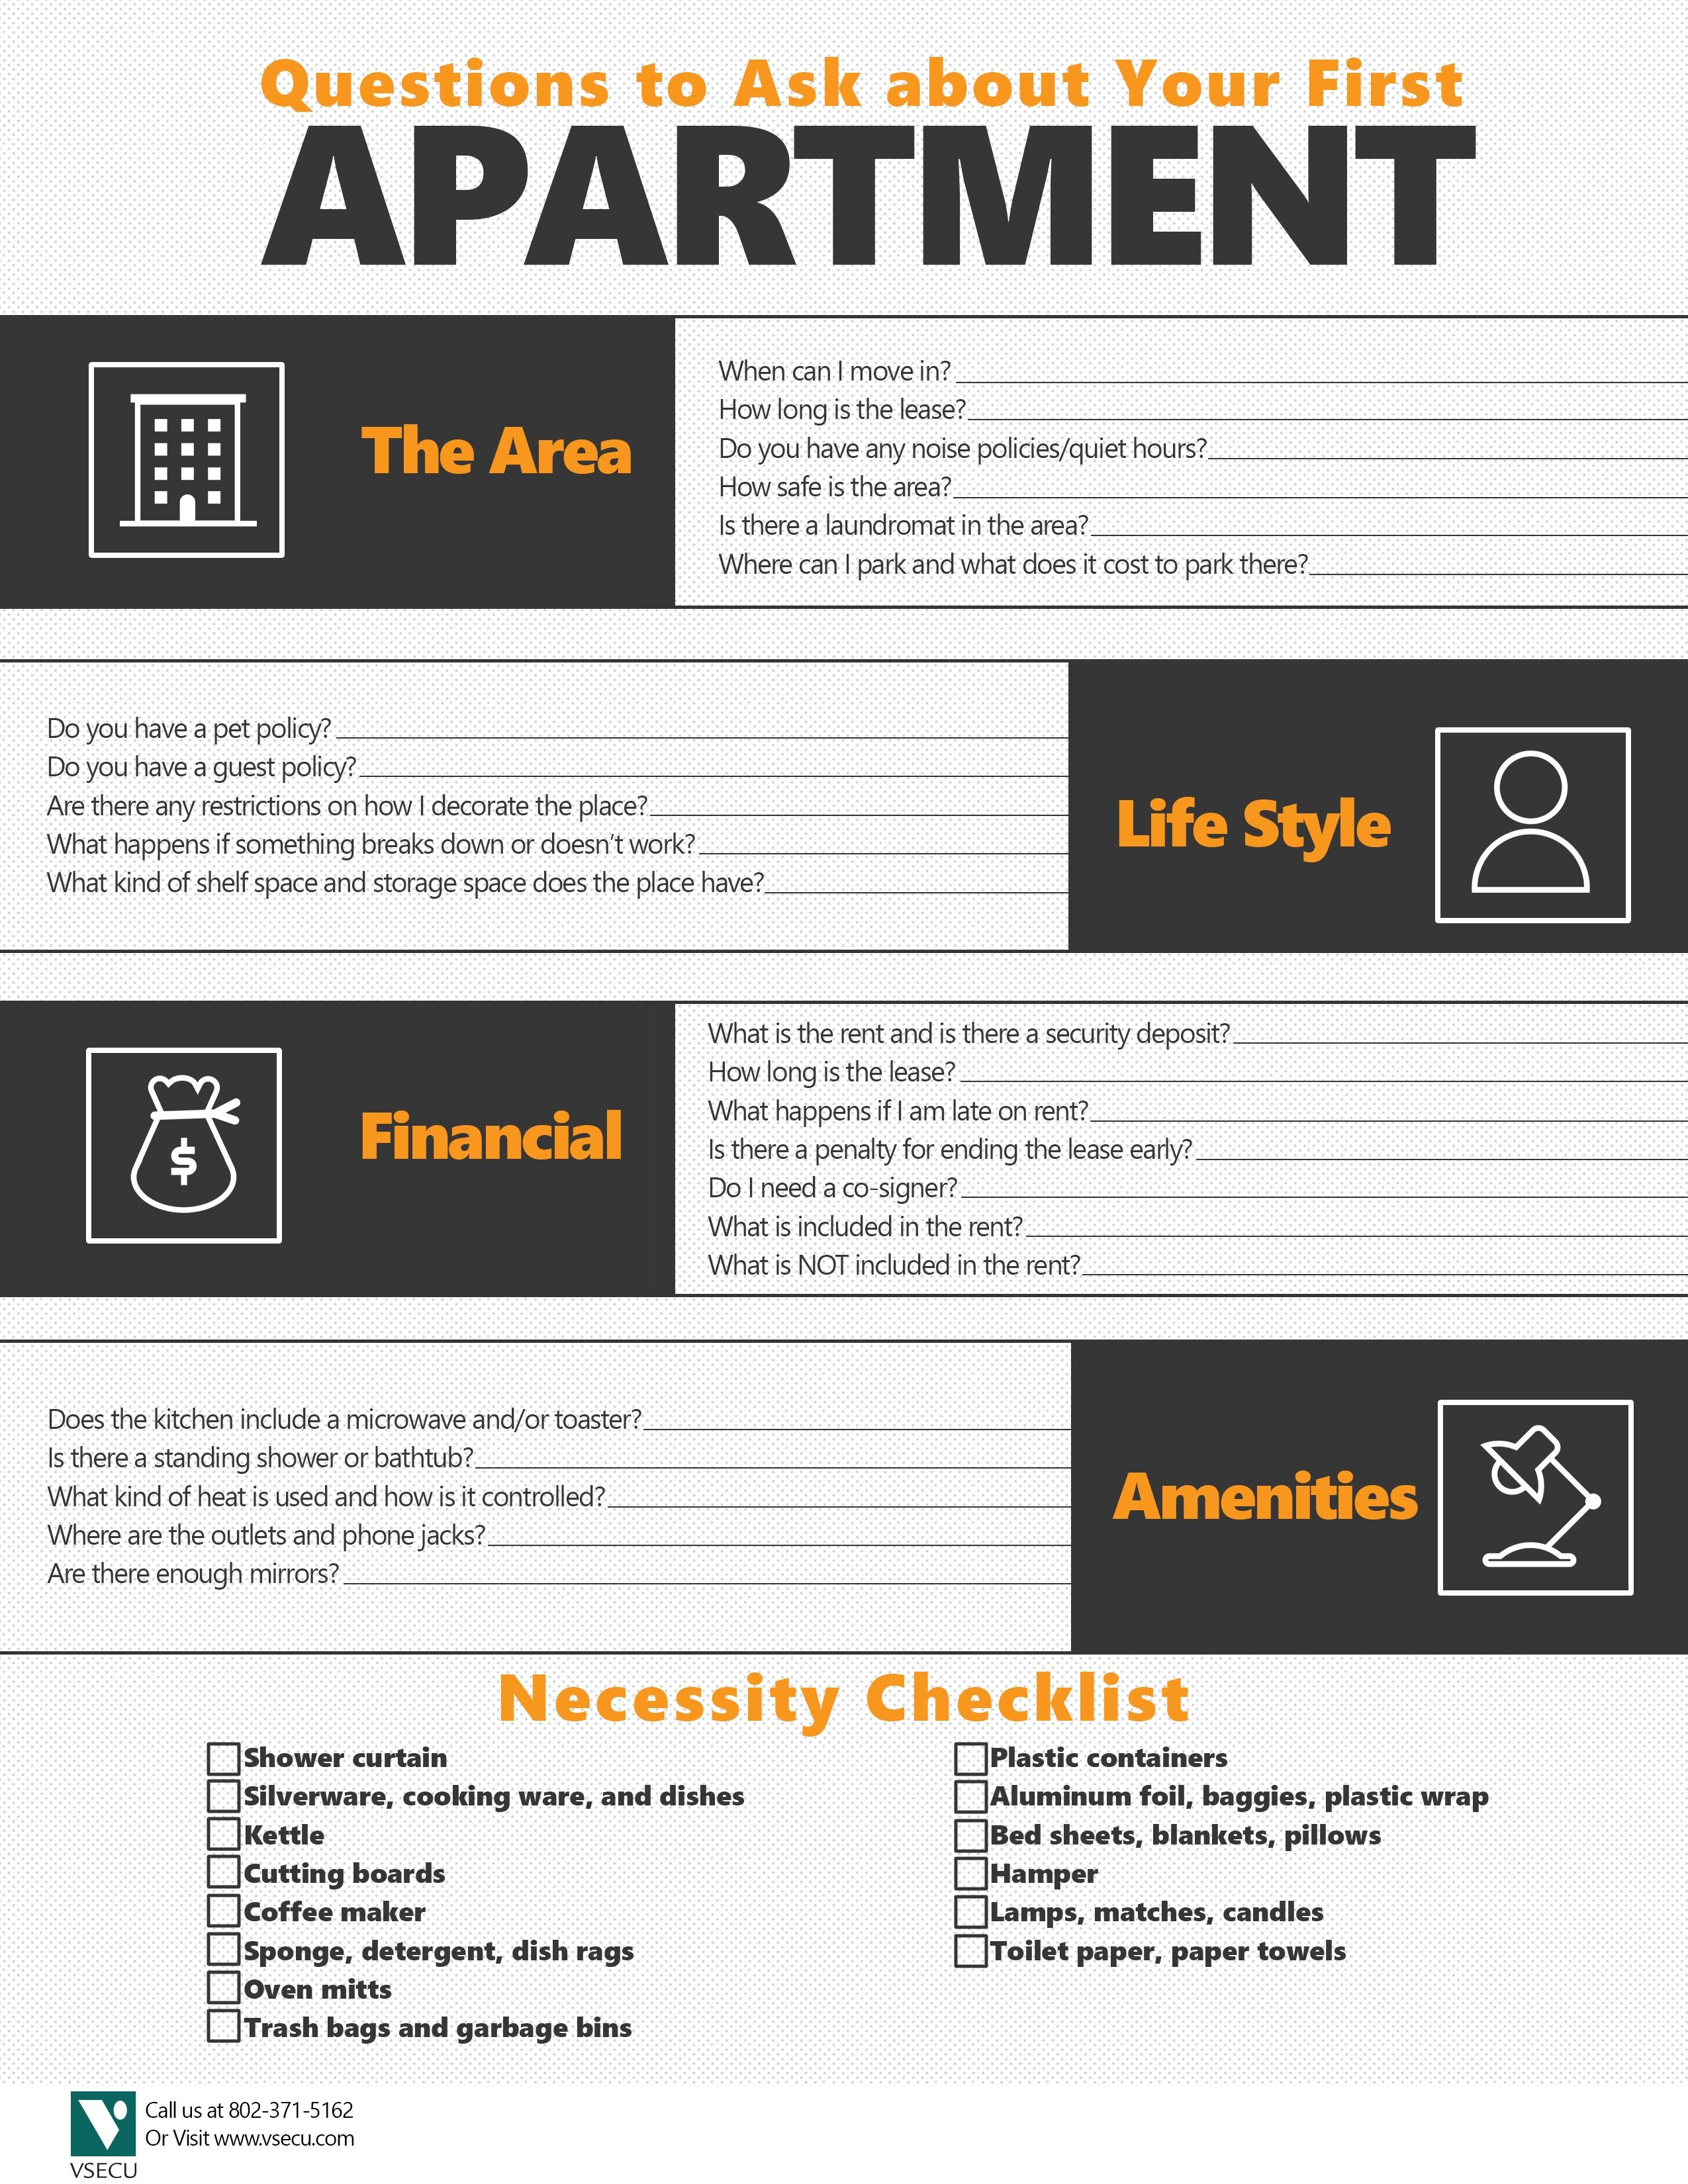 your_first_apartment_checklist.jpg